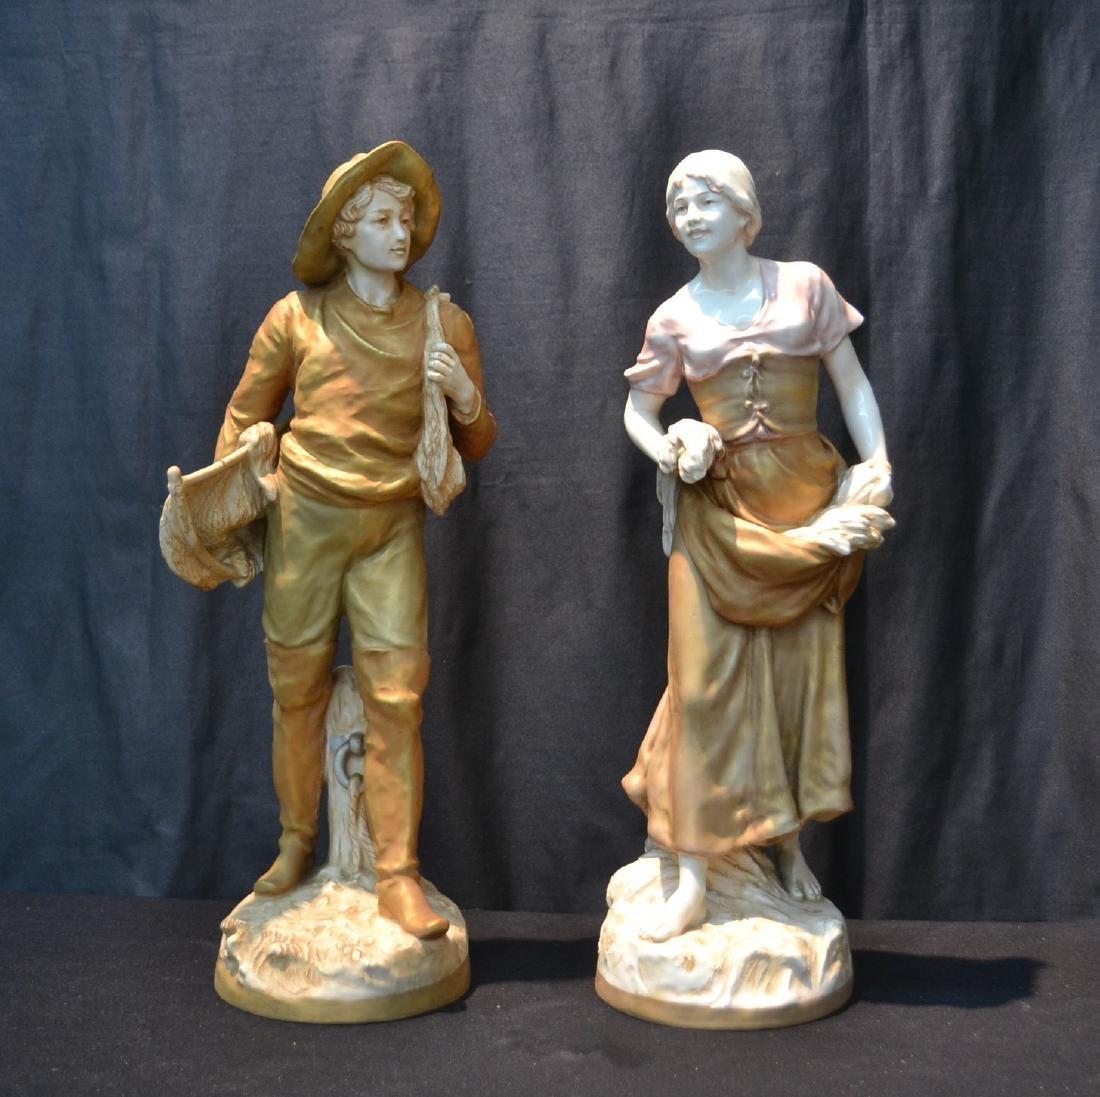 (Pr) LARGE ROYAL DUX FIGURES OF MAN & WOMAN